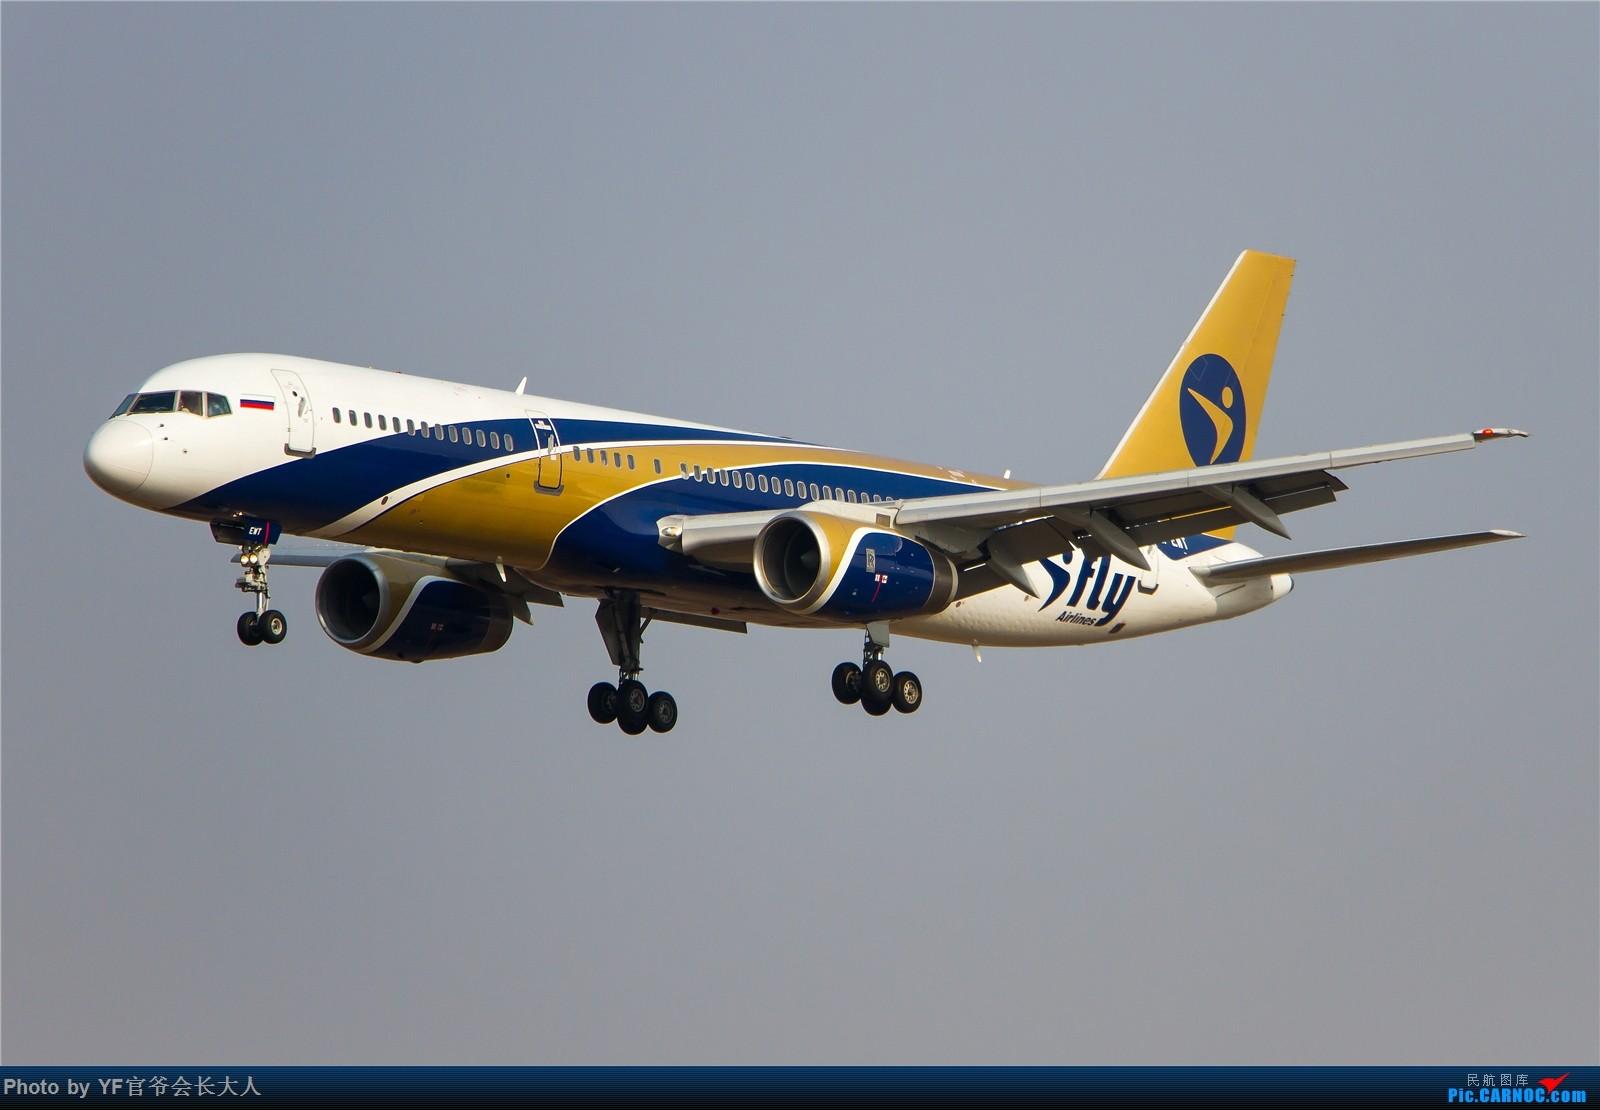 Re:[原创]【ZYTX】【1600*1066】论坛首发:俄罗斯艾菲航空公司波音757-28A,注册号:EI-EWT,还有757斯基以及最近新拍机点拍的一些好货 BOEING 757-200 EI-EWT 中国沈阳桃仙国际机场